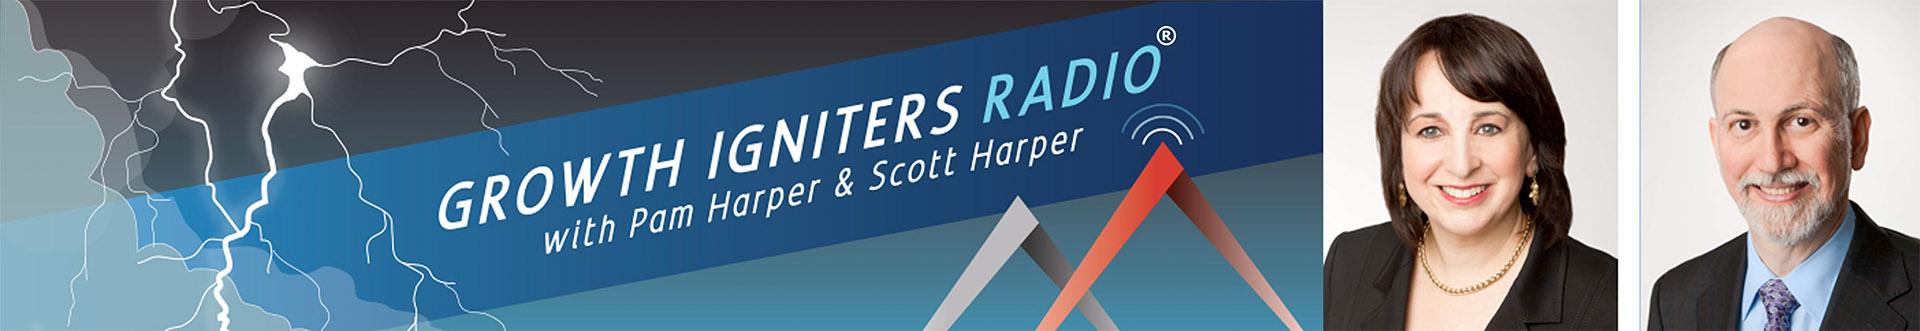 Growth Ignitors Radio